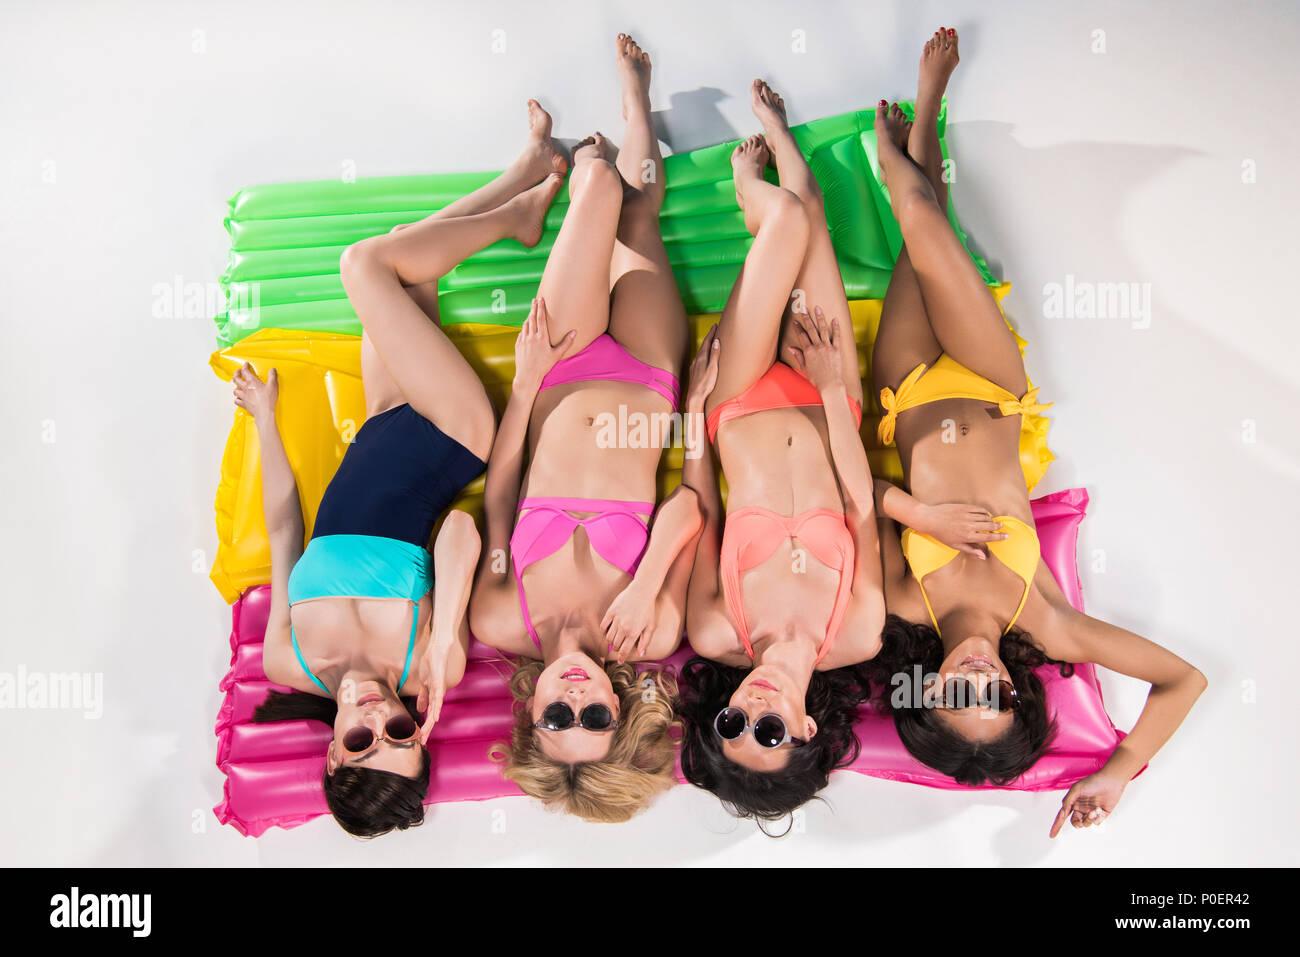 multiethnic girls in swimsuits and sunglasses sunbathing on swimming mattresses - Stock Image